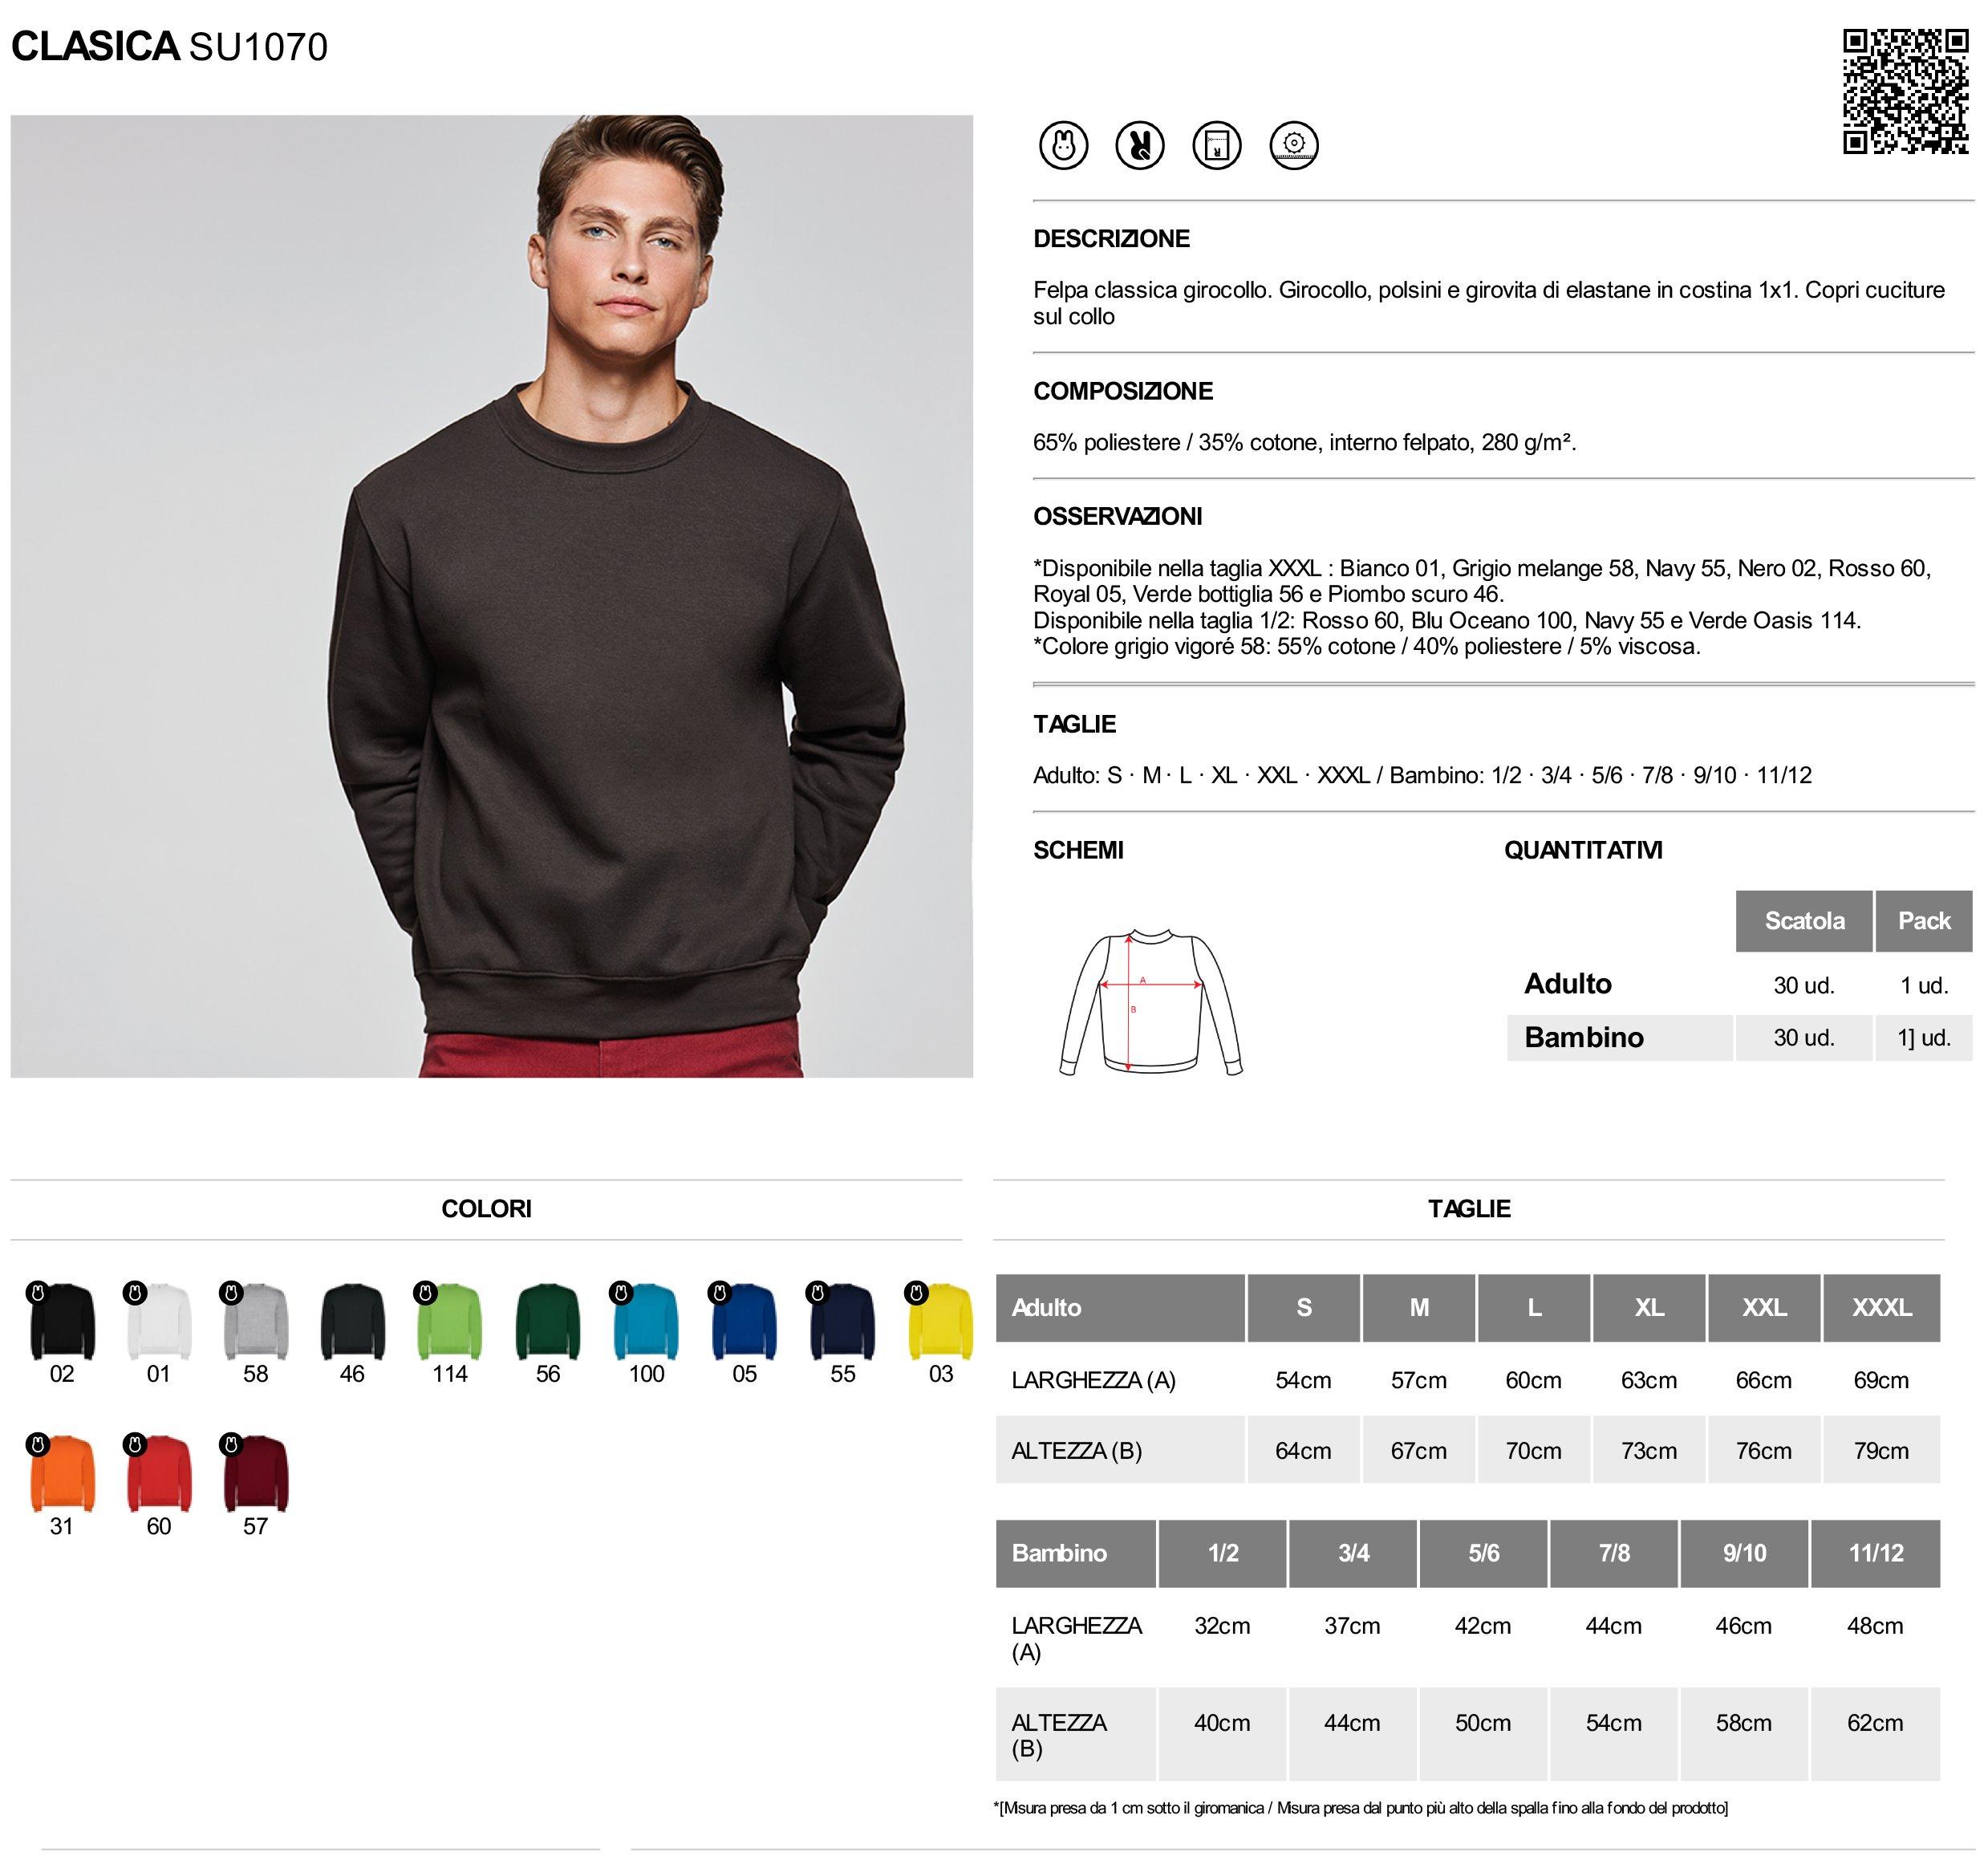 Tshirt-Express Felpa Girocollo Irama Plume - Irama Amici di Maria de Filippi  Pop Music Hip Hop Taglie Uomo Donna Bambino - Luxury Choice f880db45f655